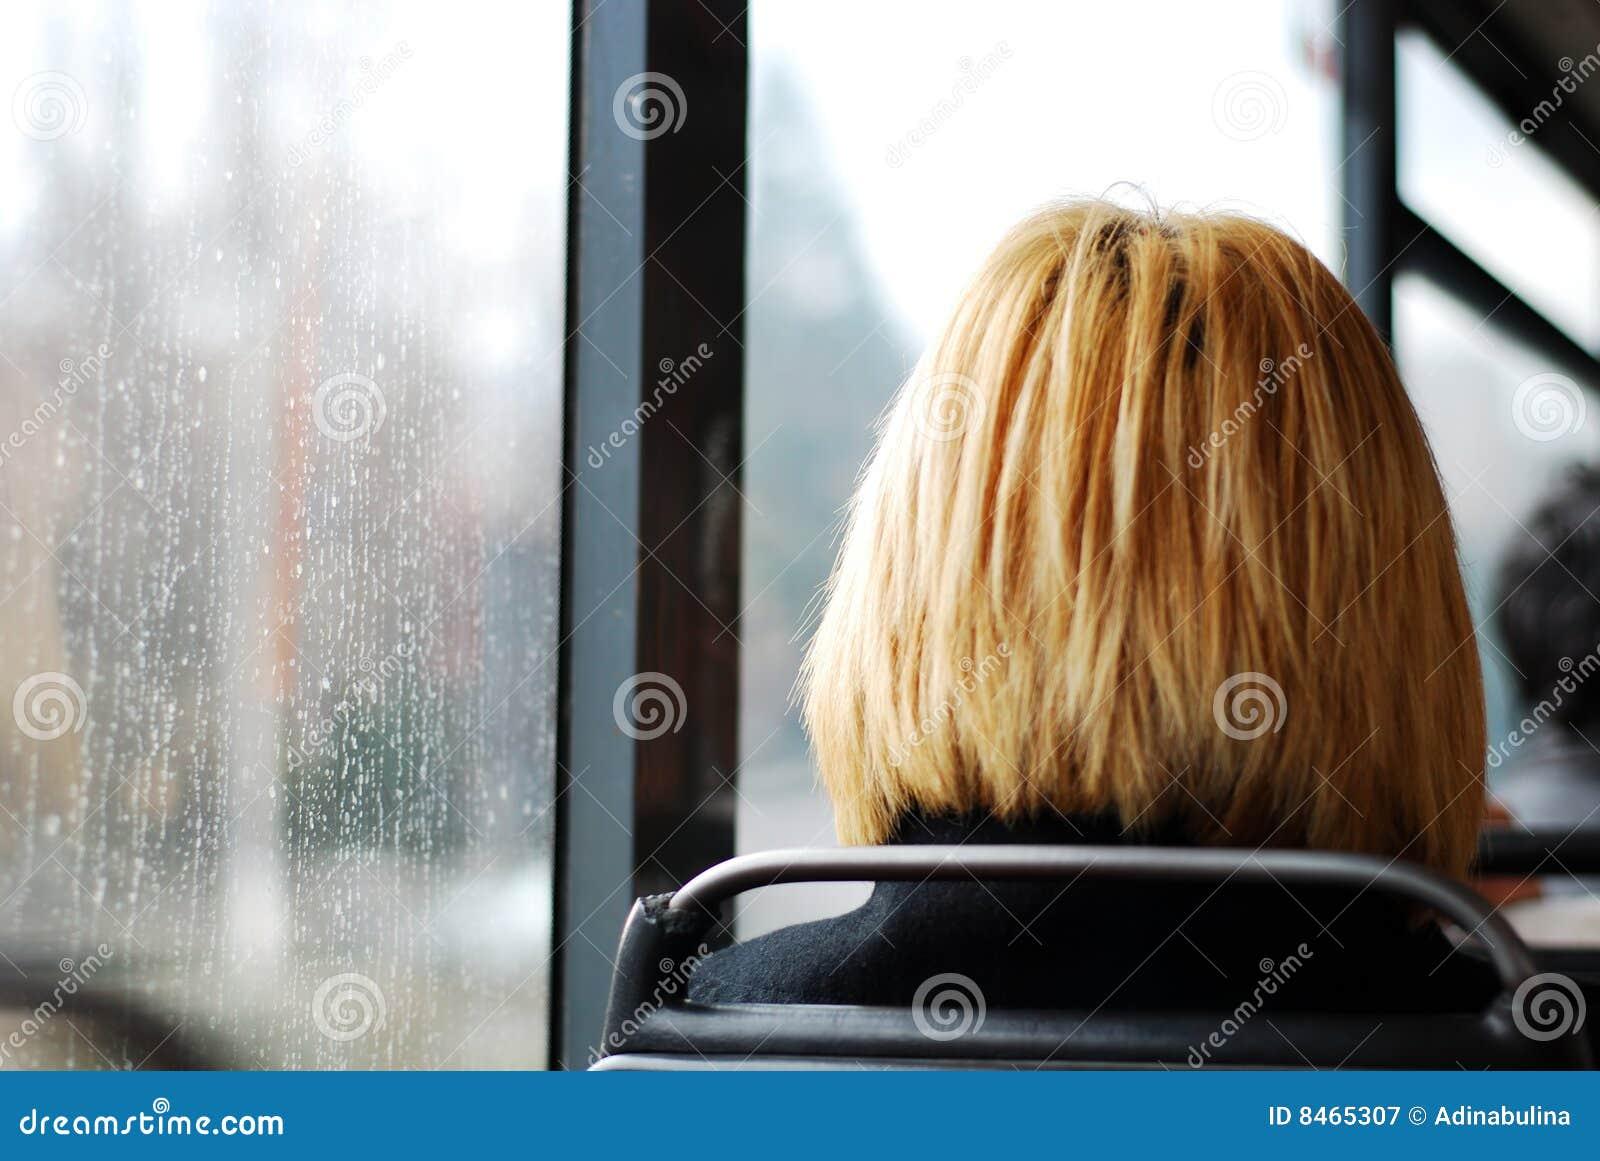 Blond bussflicka